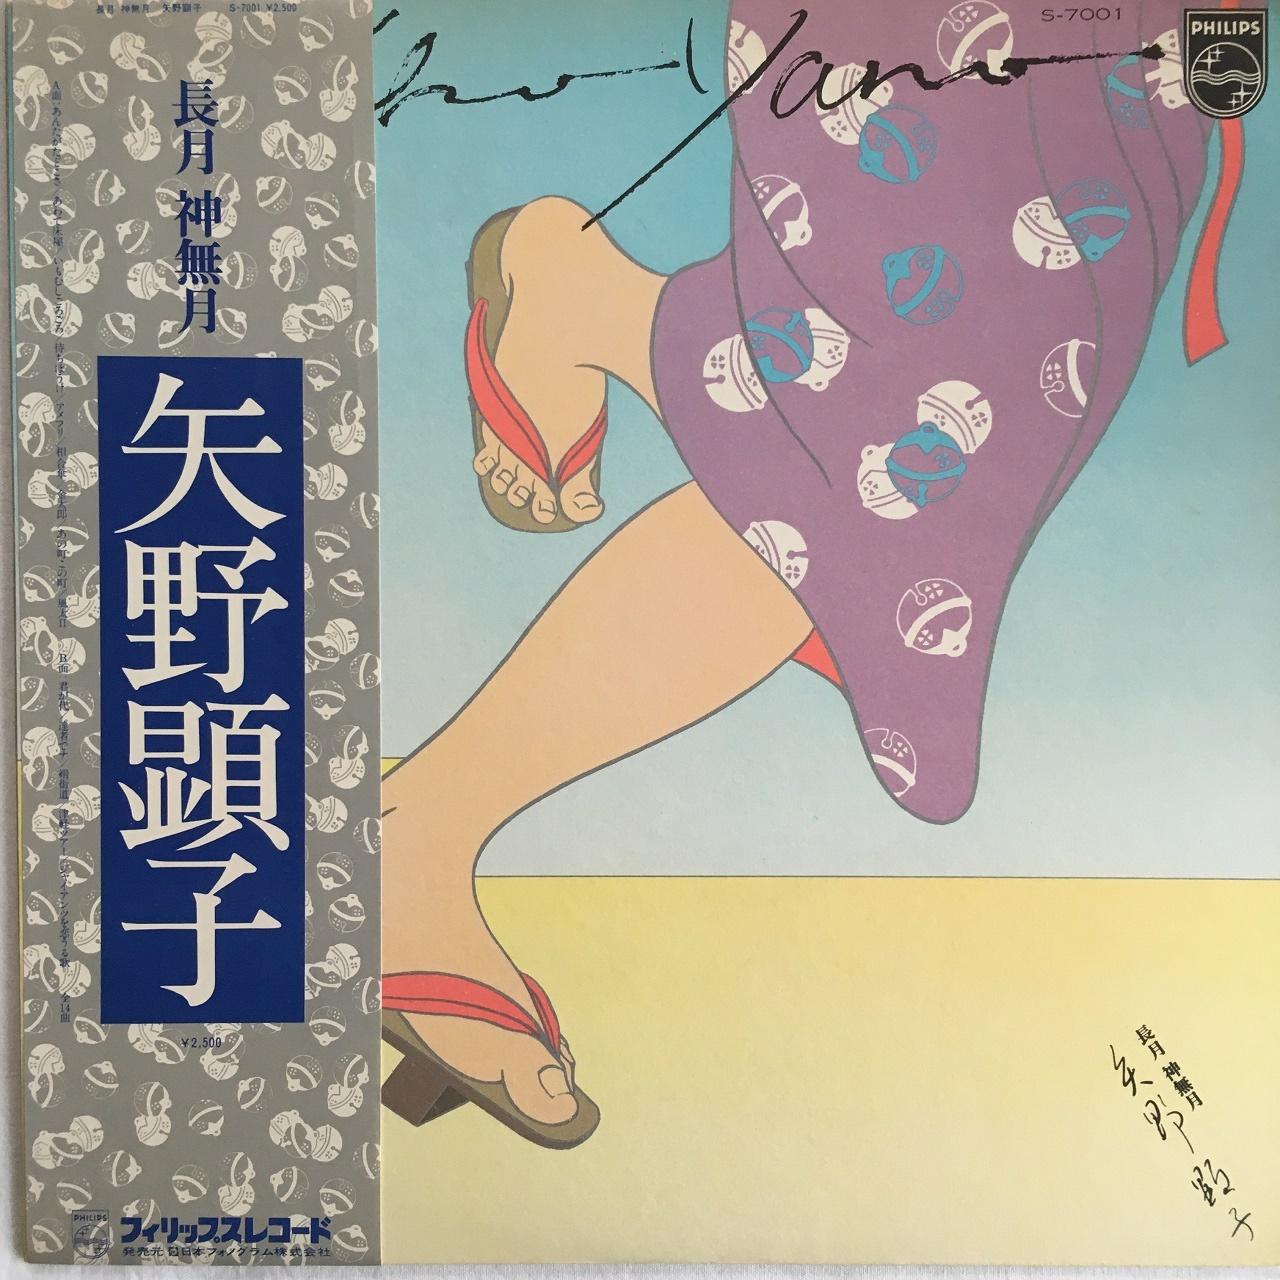 【LP・国内盤】矢野顕子 / 長月 神無月